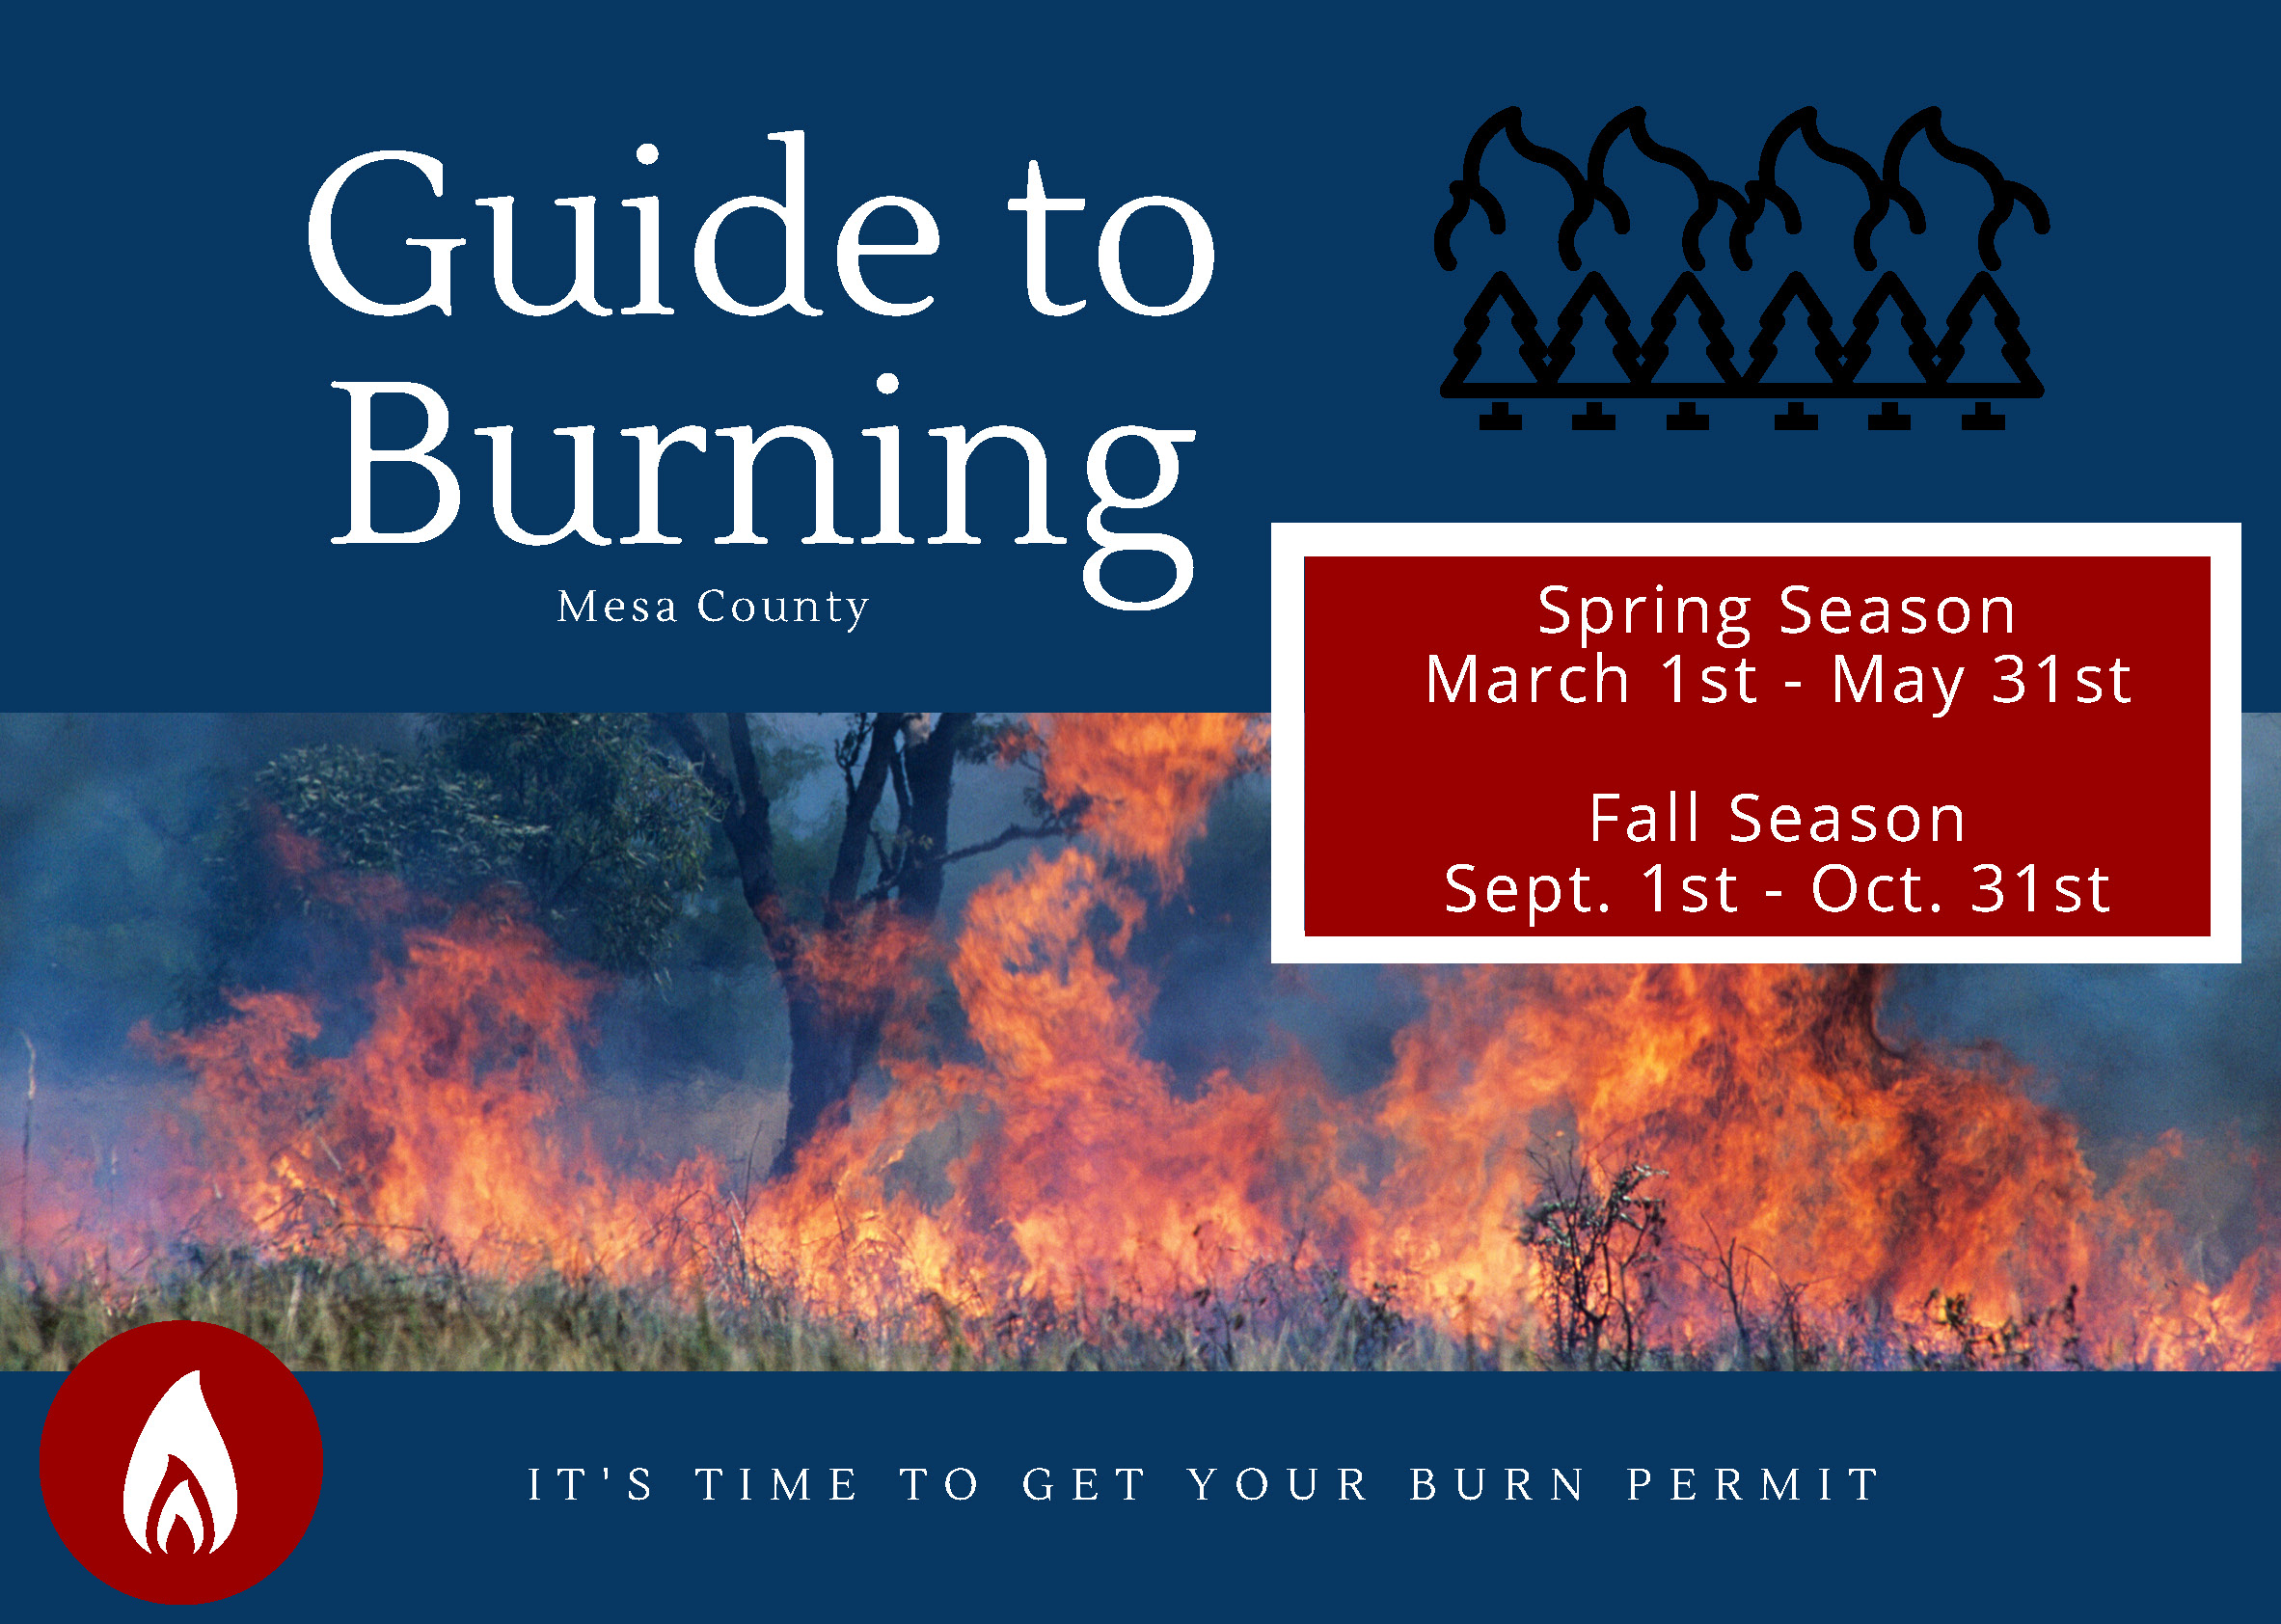 Spring Open Burn Season Ends May 31